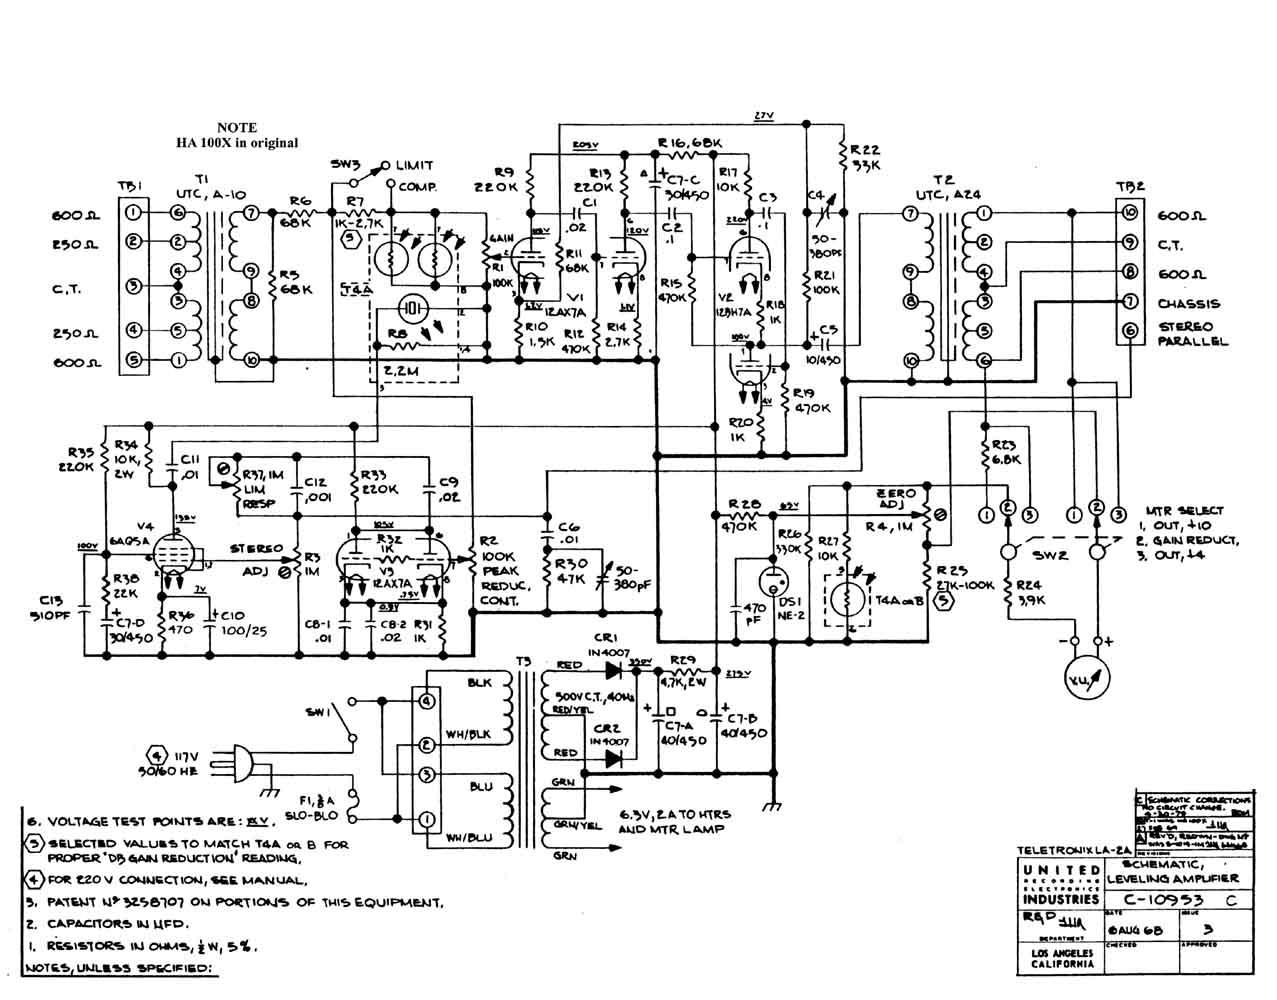 Wunderbar Honda Generator Schaltplan Ideen - Verdrahtungsideen ...